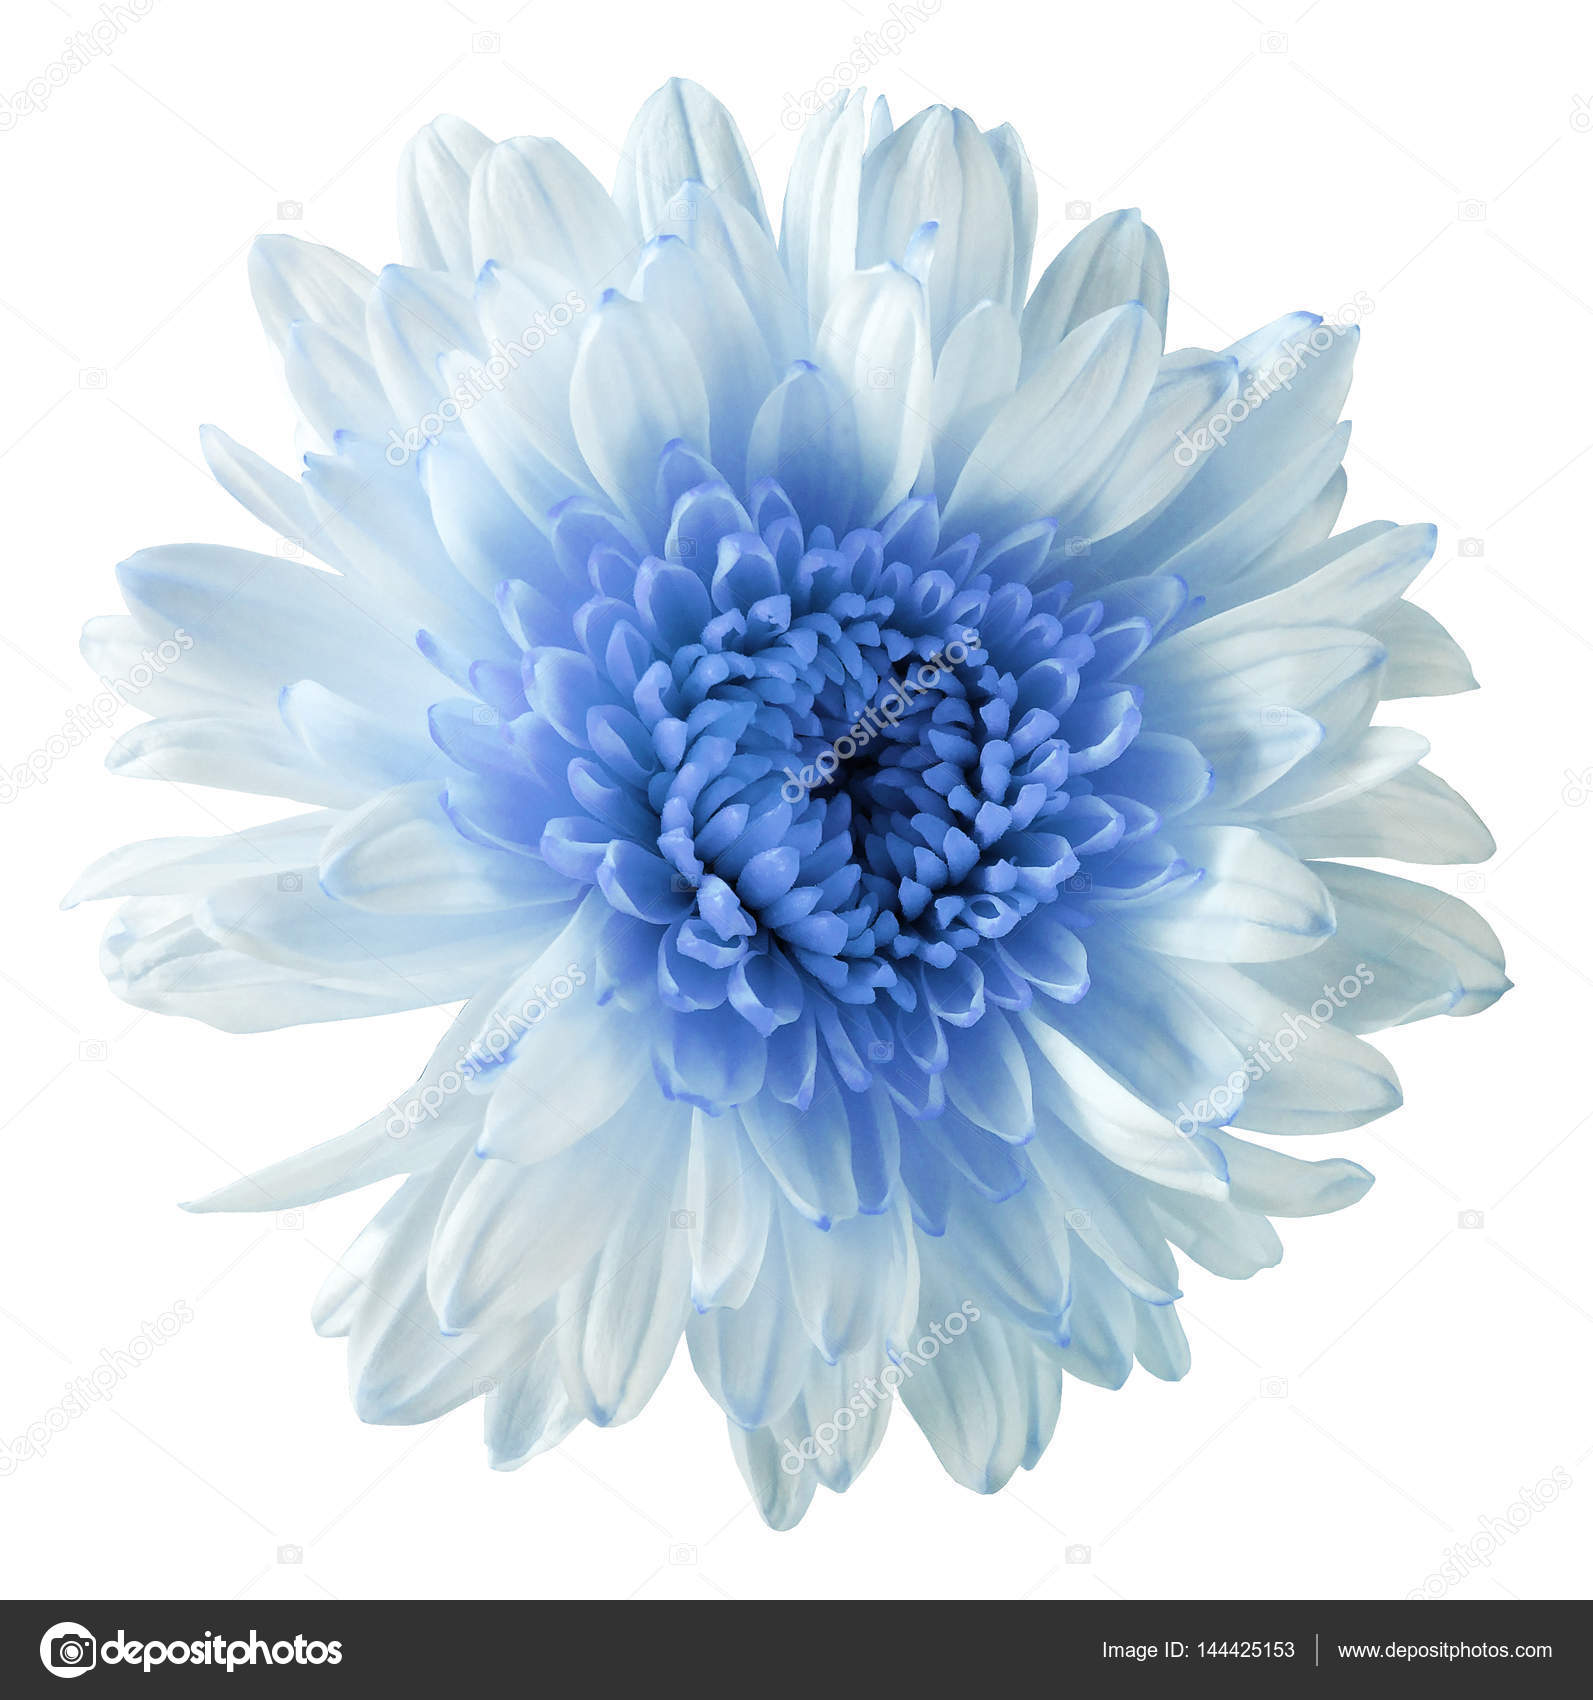 White blue flower chrysanthemum garden flower white isolated white blue flower chrysanthemum garden flower white isolated background with clipping path closeup no shadows blue centre nature mightylinksfo